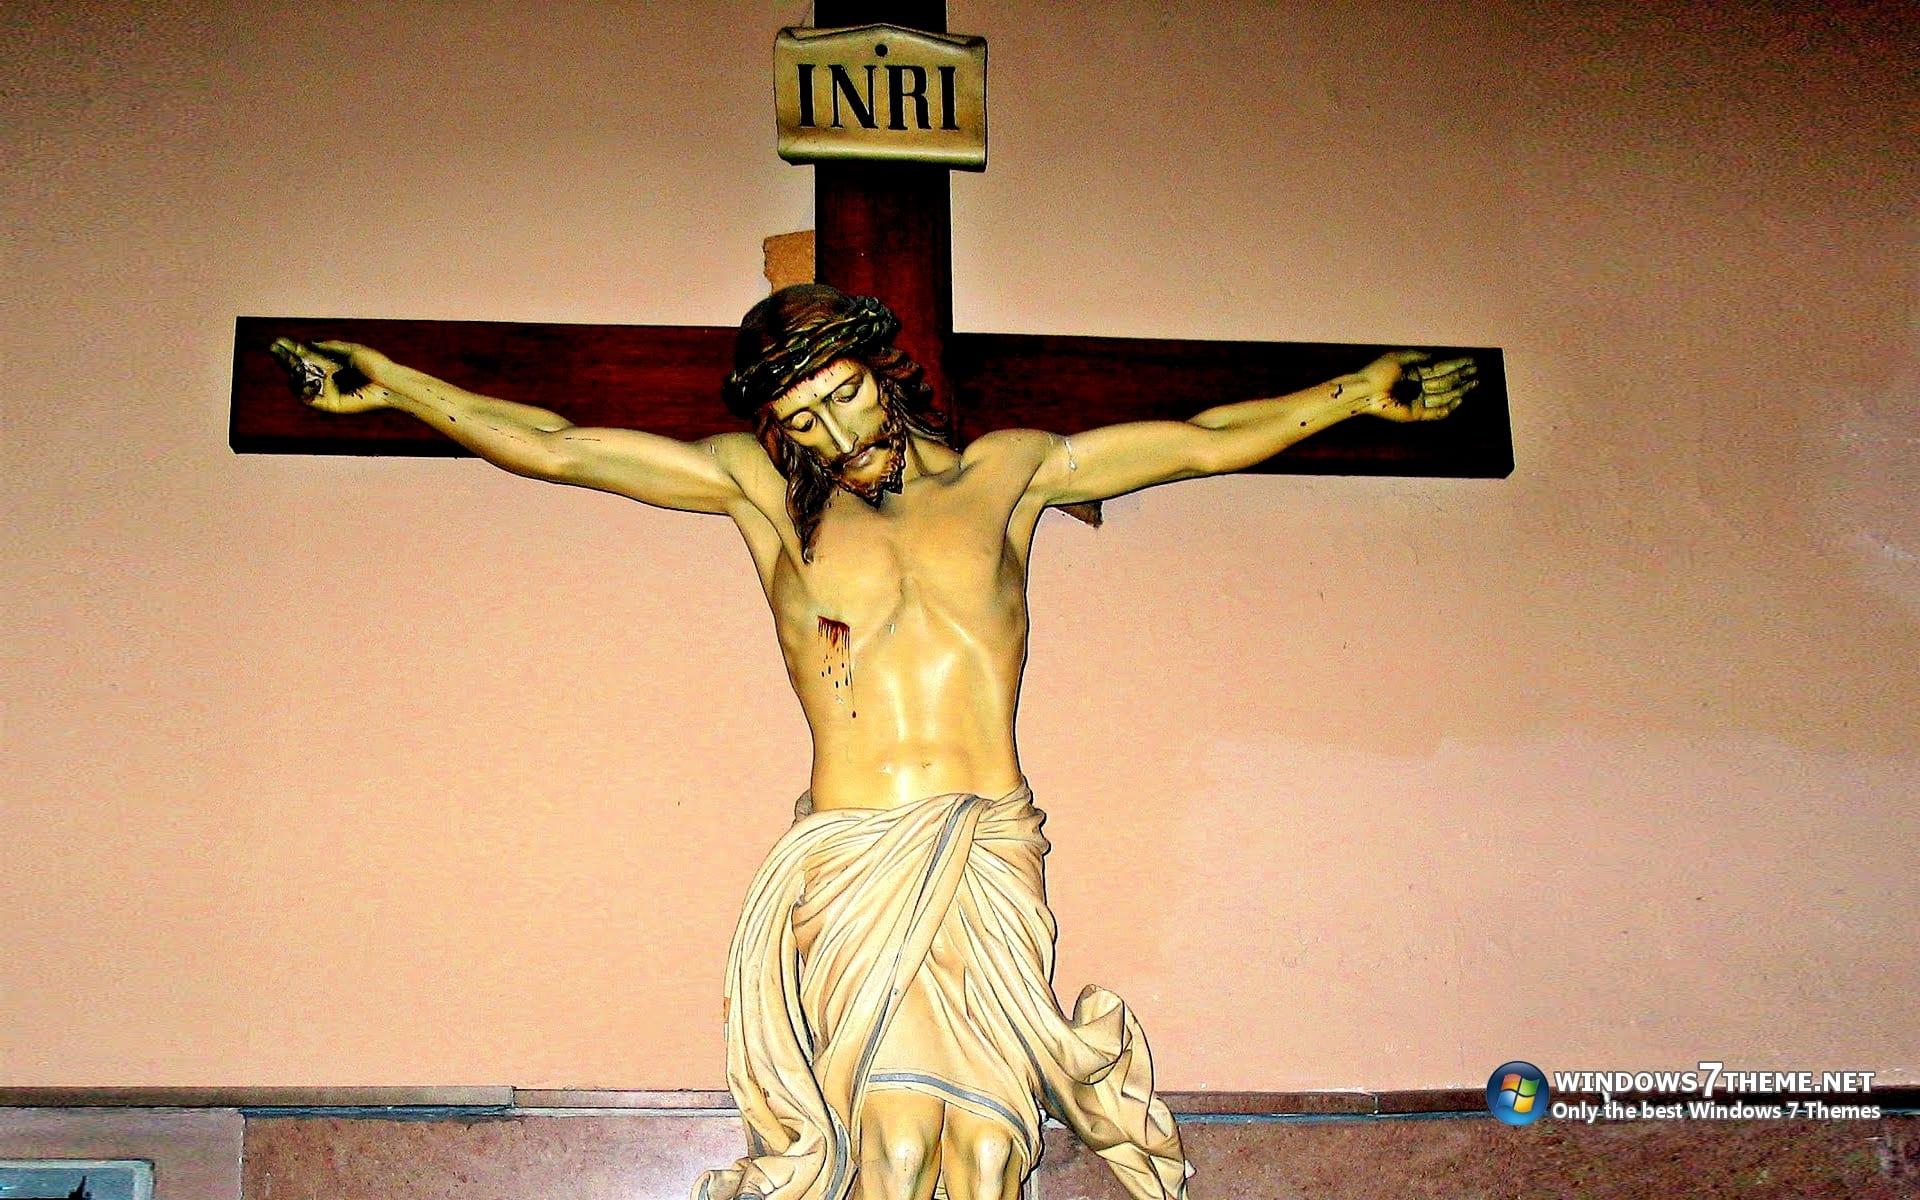 Jesus Christ Windows 7 Theme (Windows) - Download